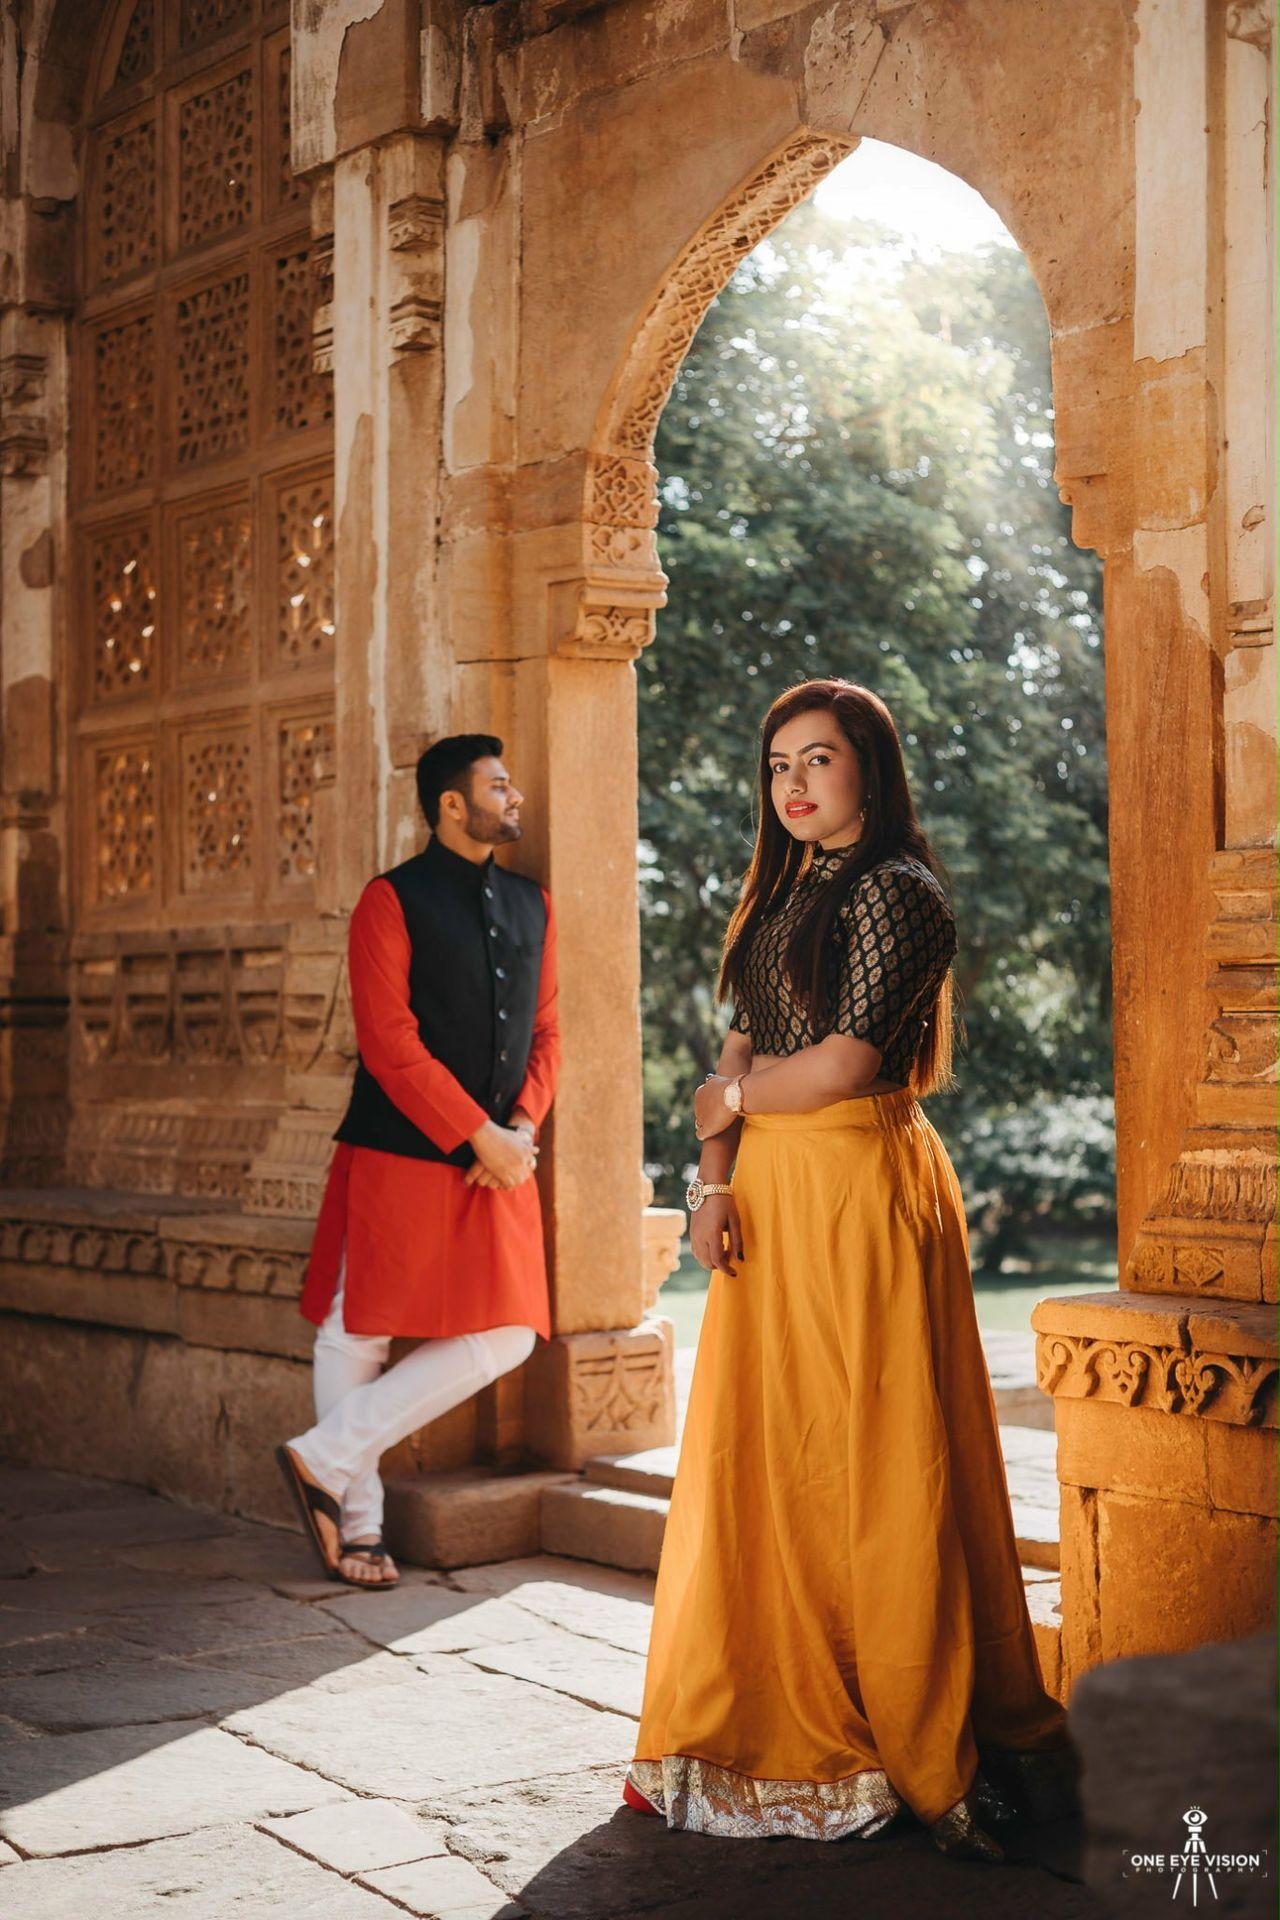 2018-ronak-and-kinnari-pre-wedding-one-eye-vision-pre-wedding-photography-couple-shoot-wedding-portraits-pre-wedding-shoot-pre-wedding-photos-indian-pre-wedding-photogr